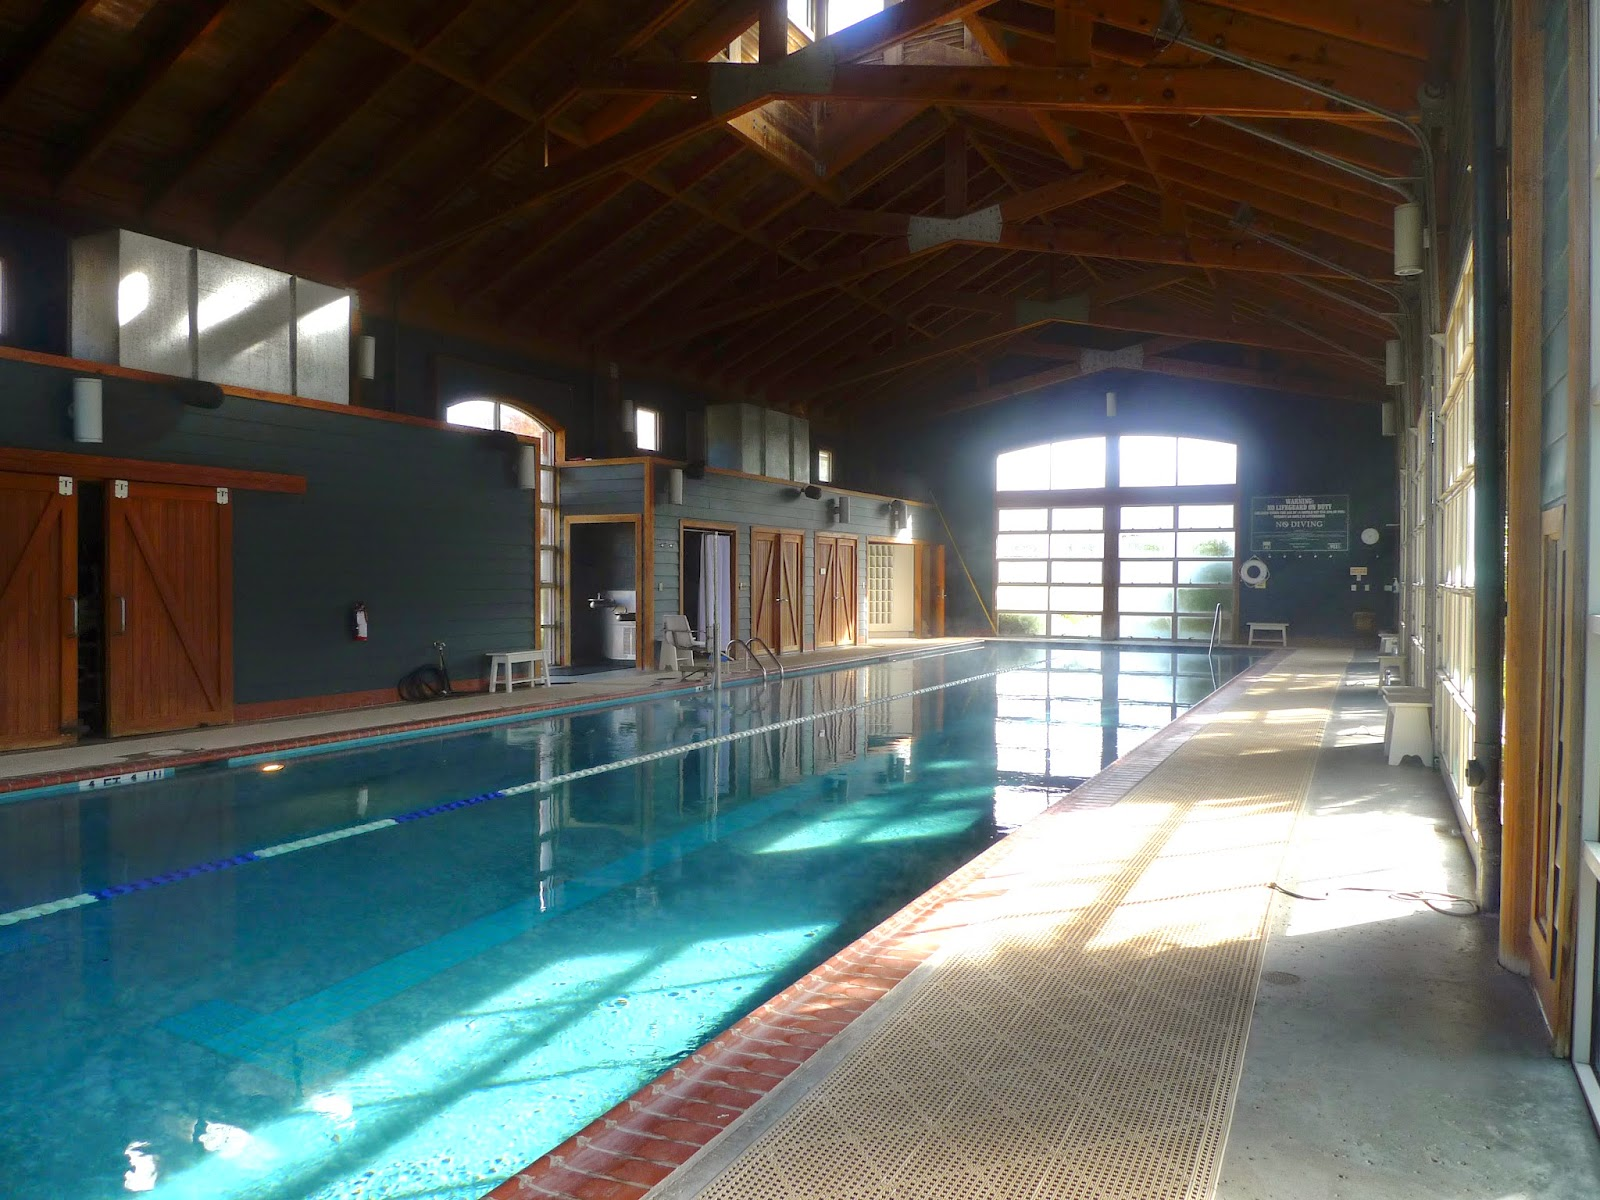 Cravate Noire Lake Austin Spa Resort Review And Photoblog